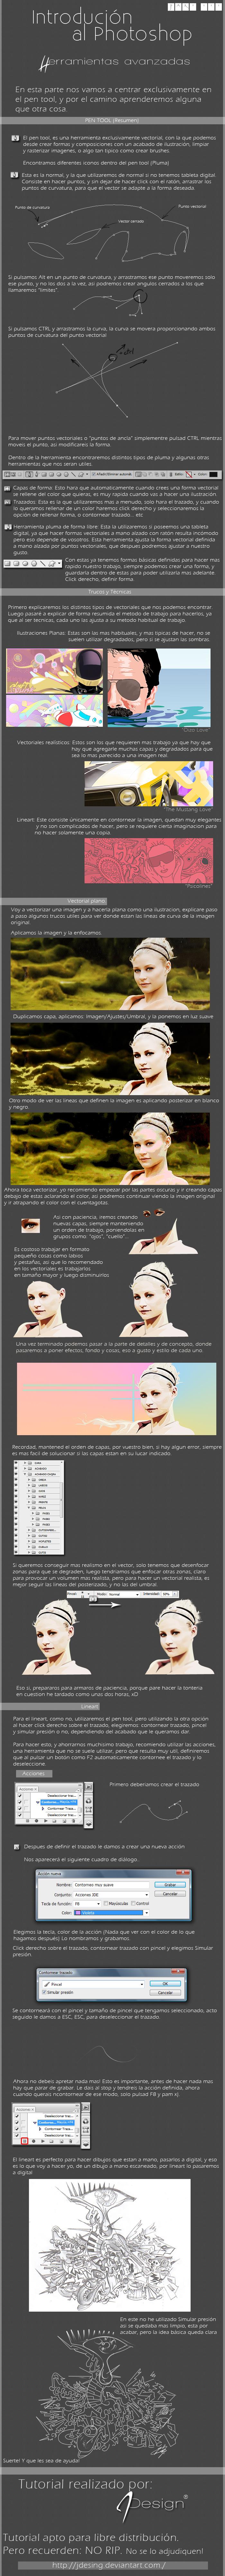 Conoce Ps o0Tutorial de aprendizaje0o Photoshop_Initials_Part_III_by_Jdesing